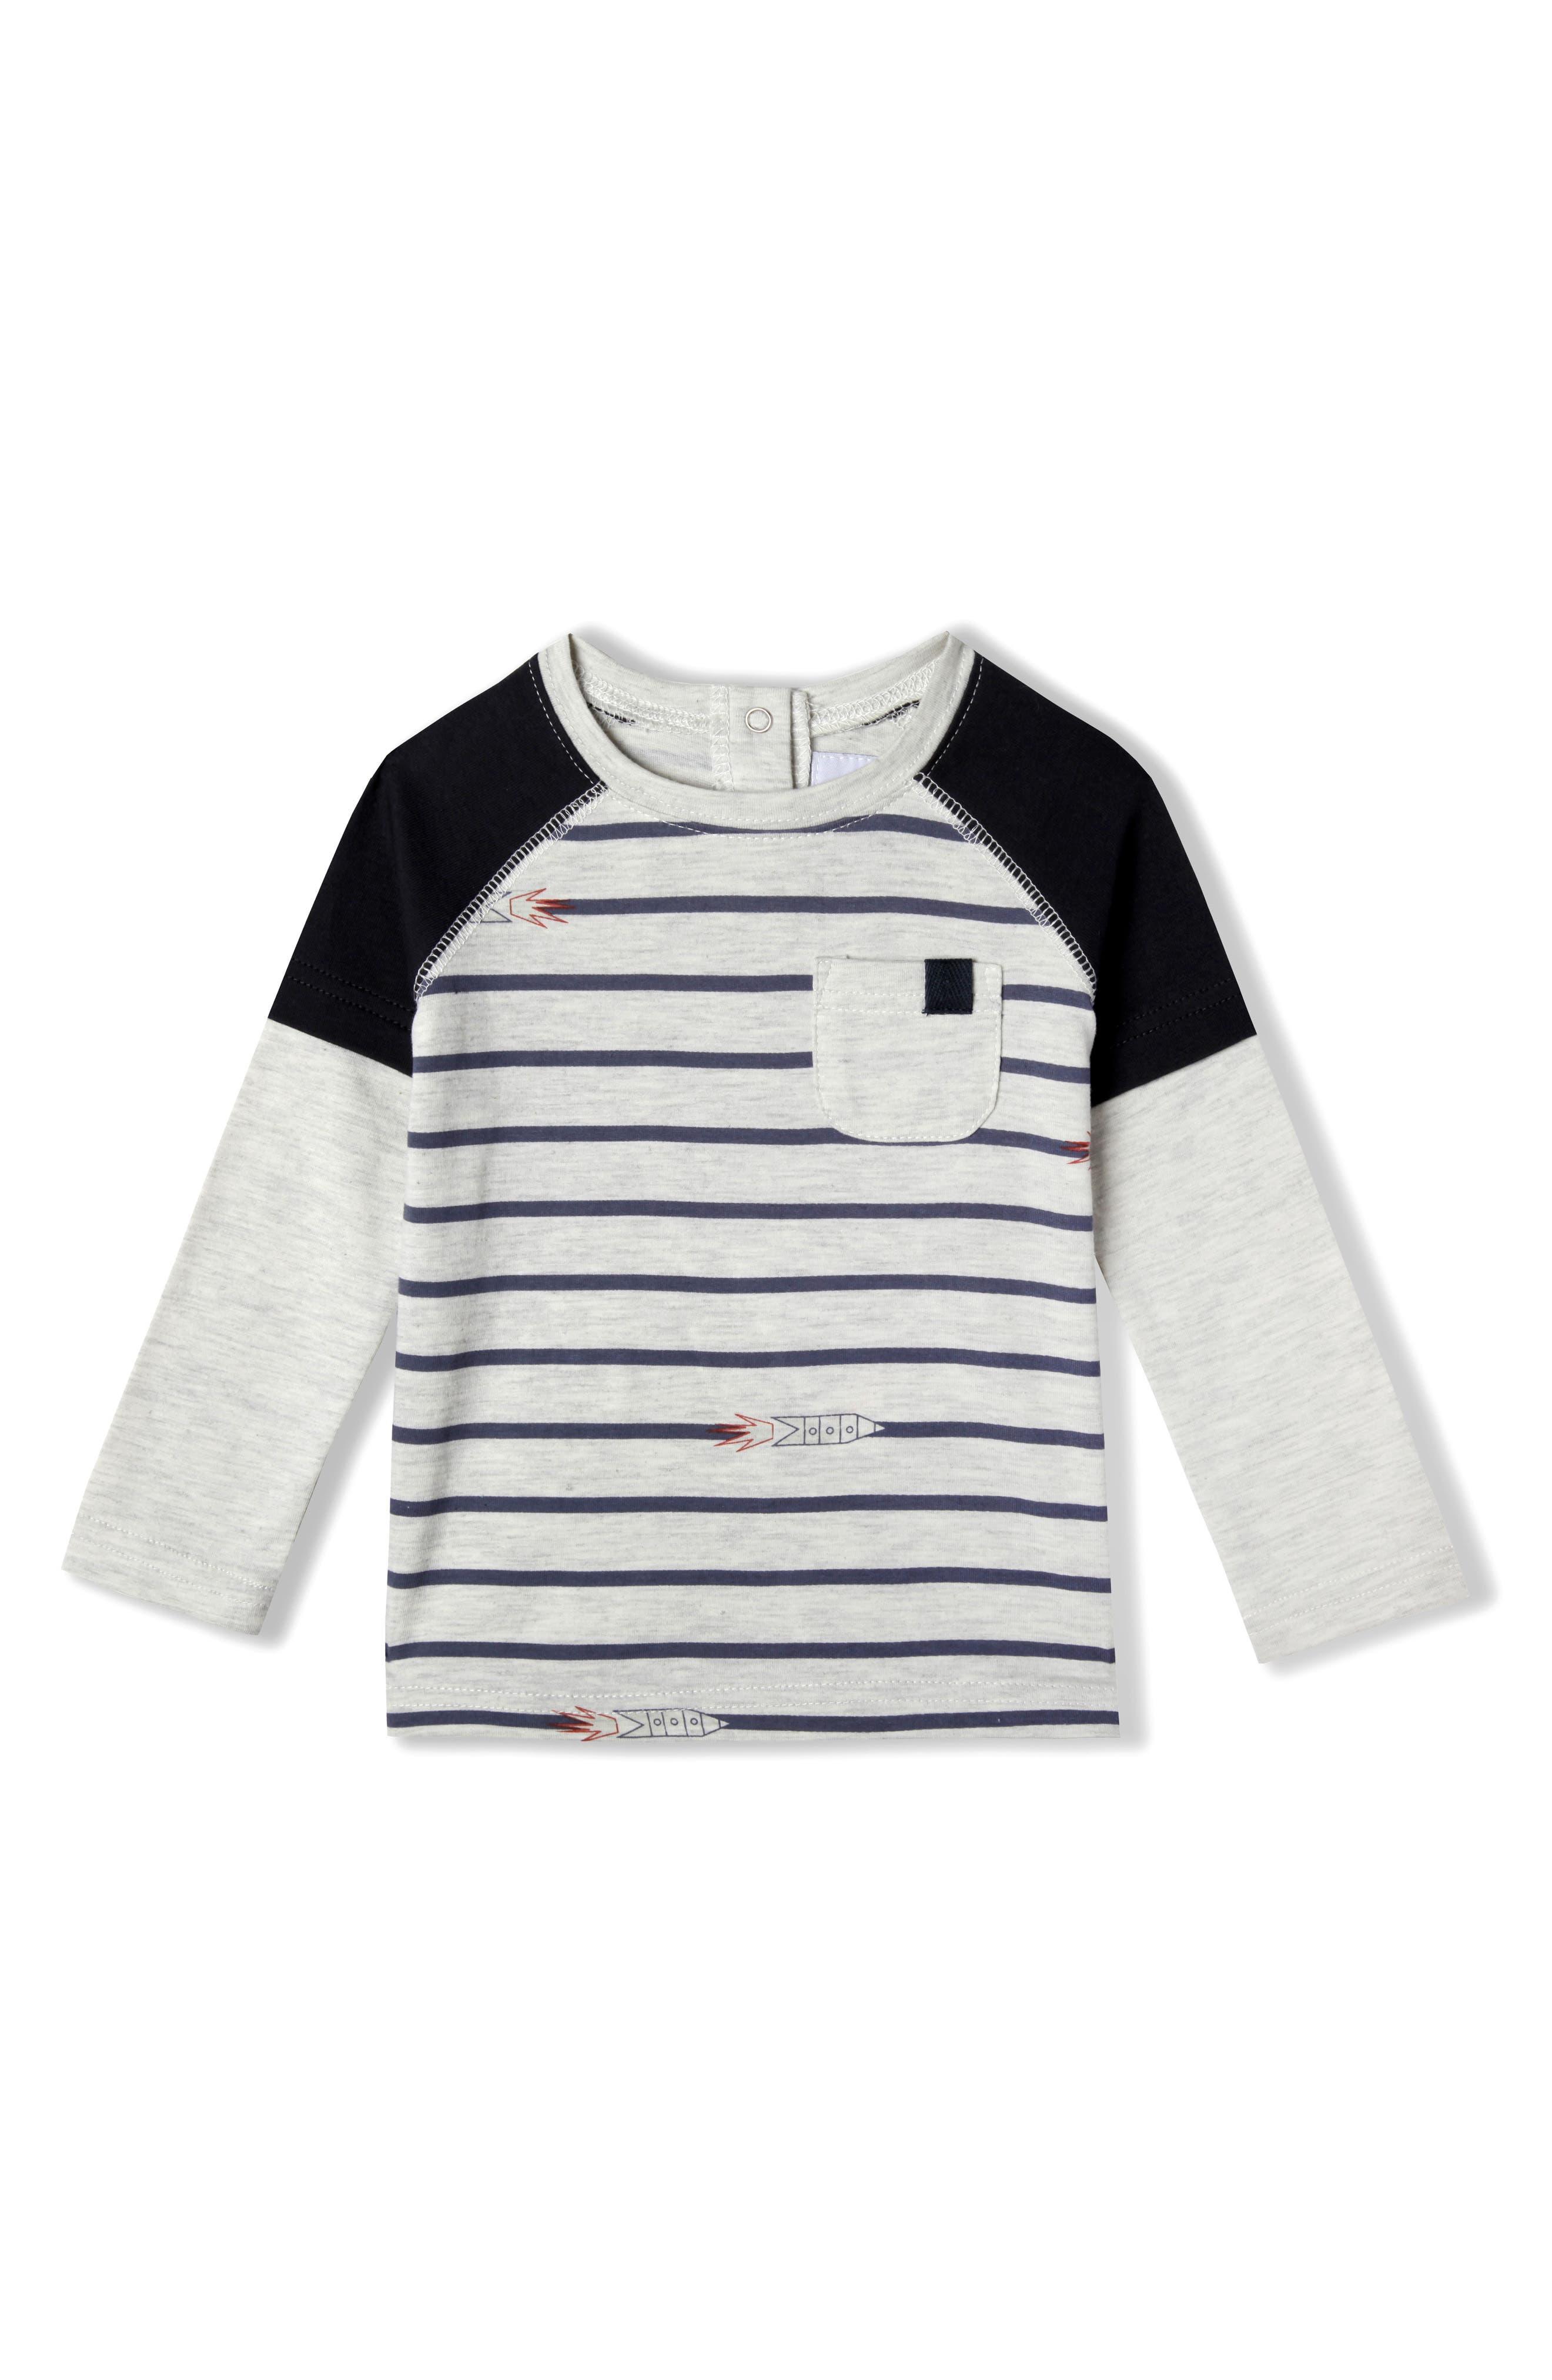 Rocket Organic Cotton T-Shirt,                         Main,                         color, Marled